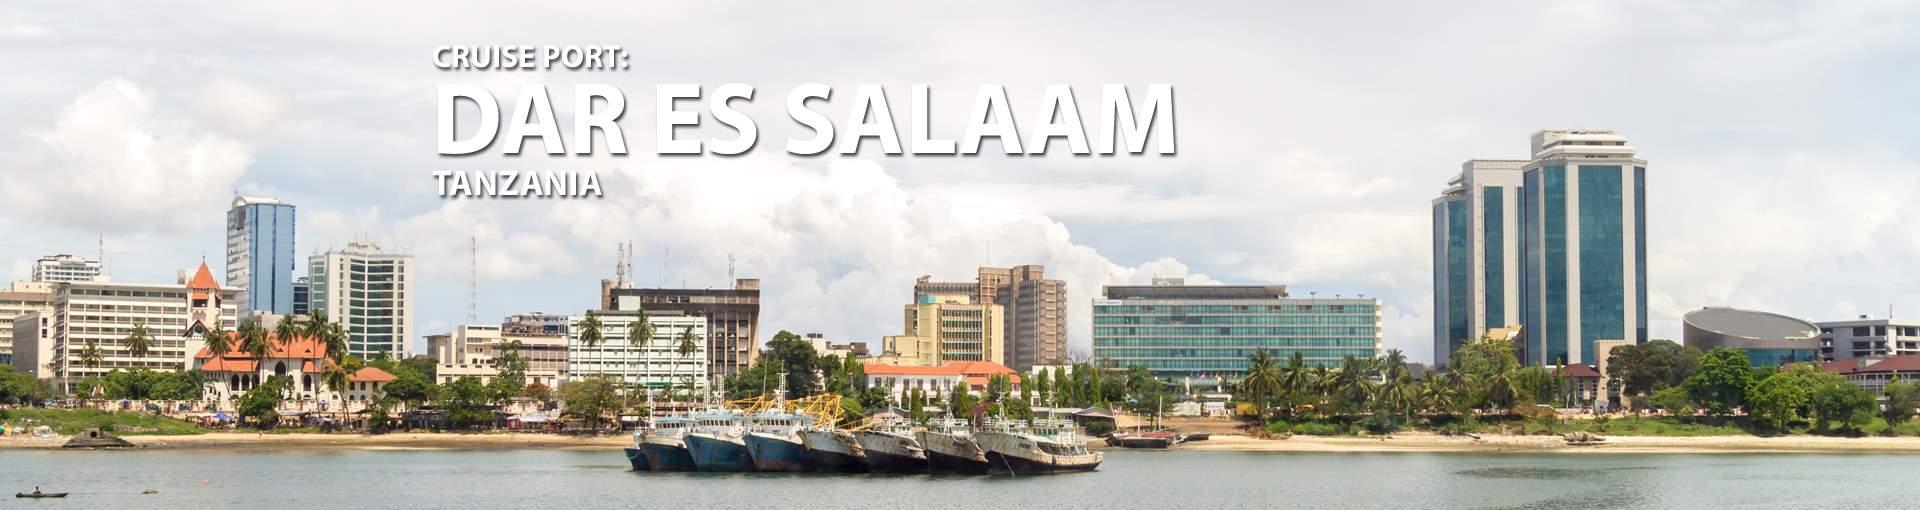 Cruises to Dar es Salaam, Tanzania